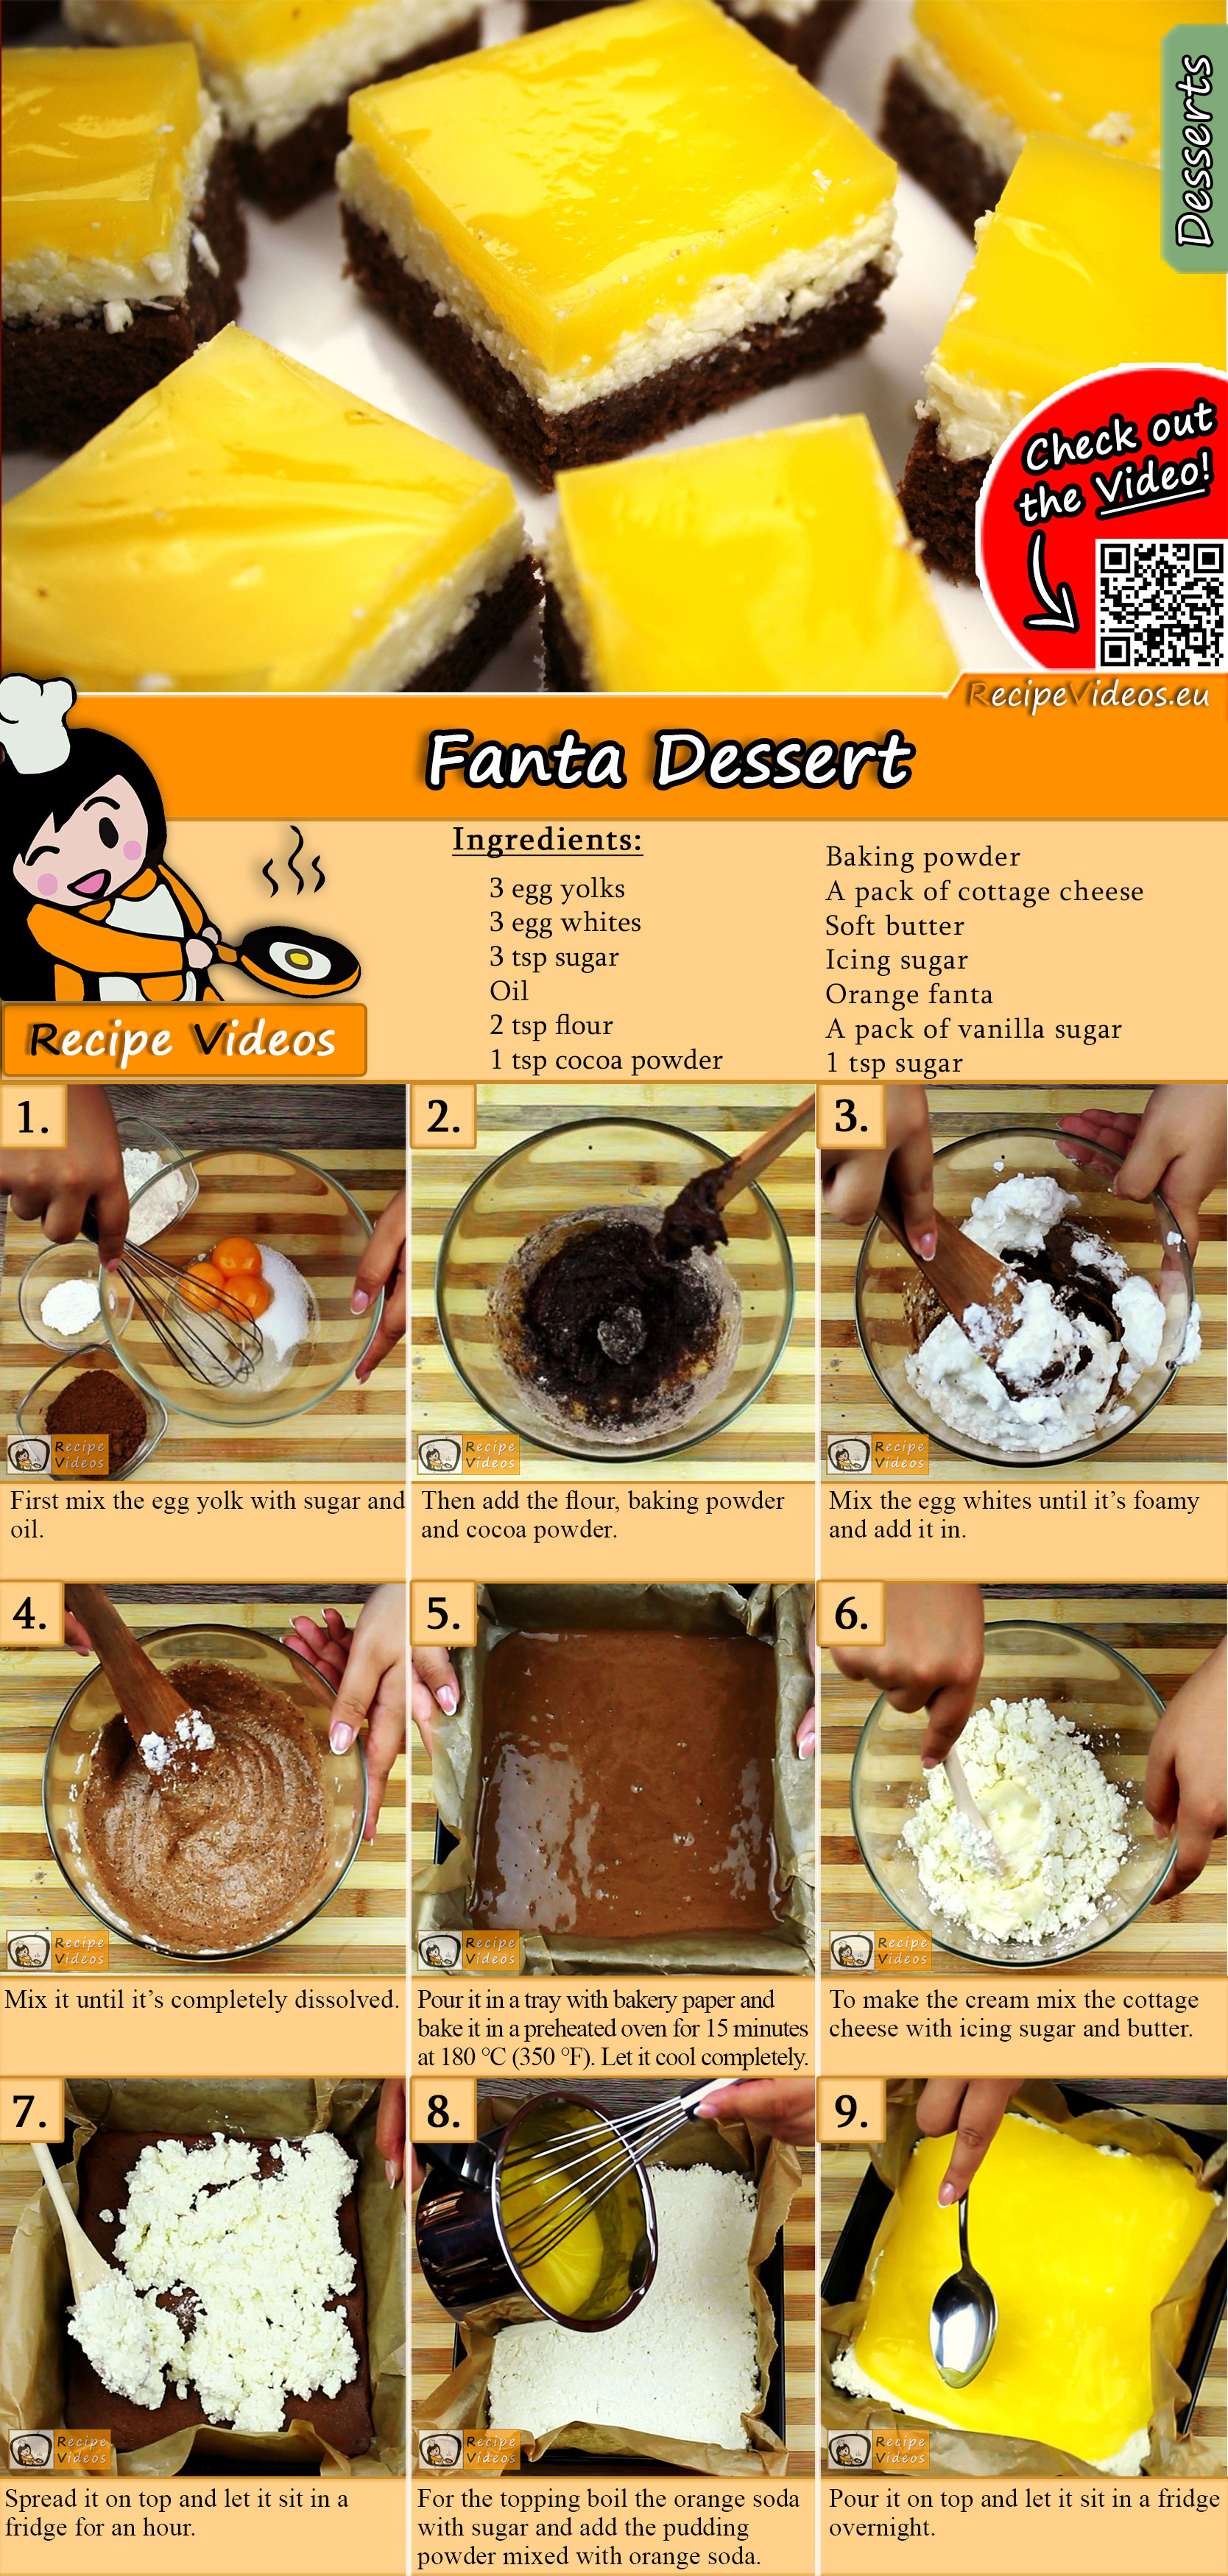 Fanta Dessert recipe with video